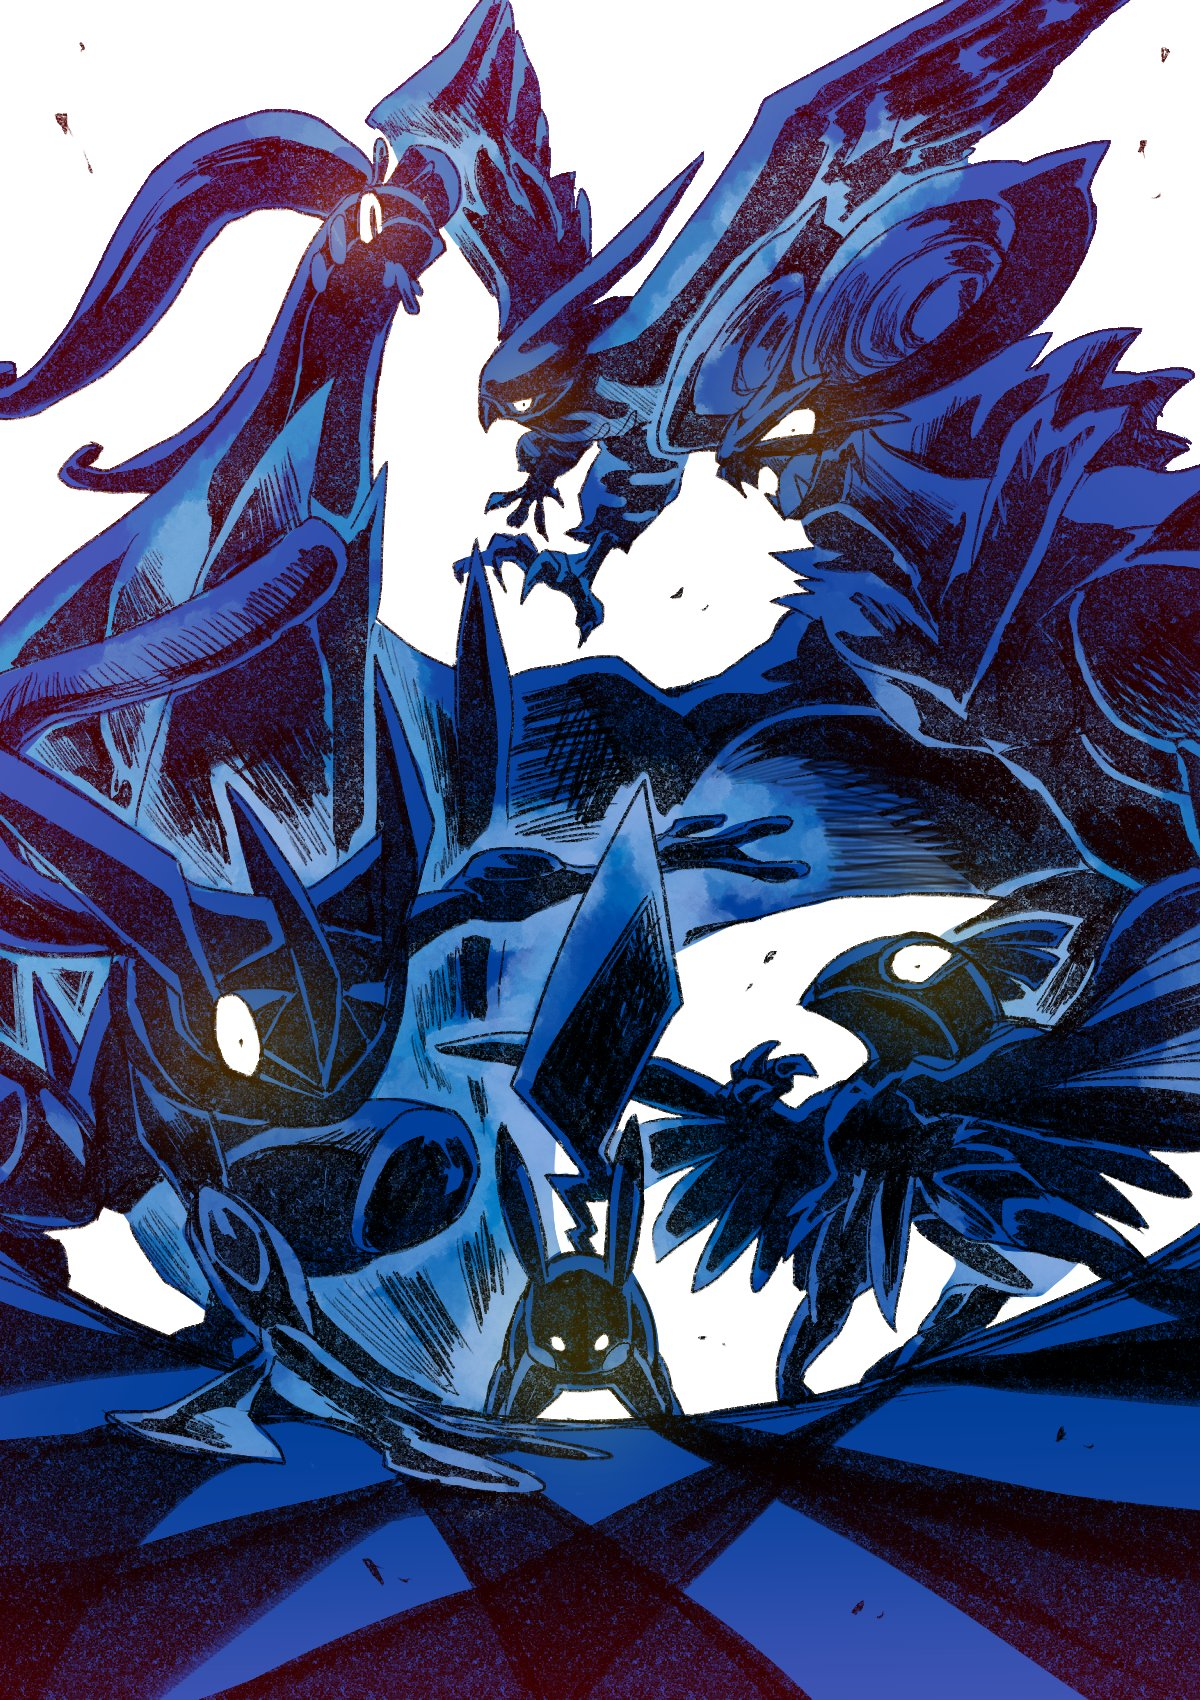 bird commentary_request fangs from_below gen_1_pokemon gen_6_pokemon glowing glowing_eyes goodra greninja harvest88 hawlucha highres legs_apart no_humans noivern open_mouth pikachu pokemon pokemon_(creature) standing talonflame